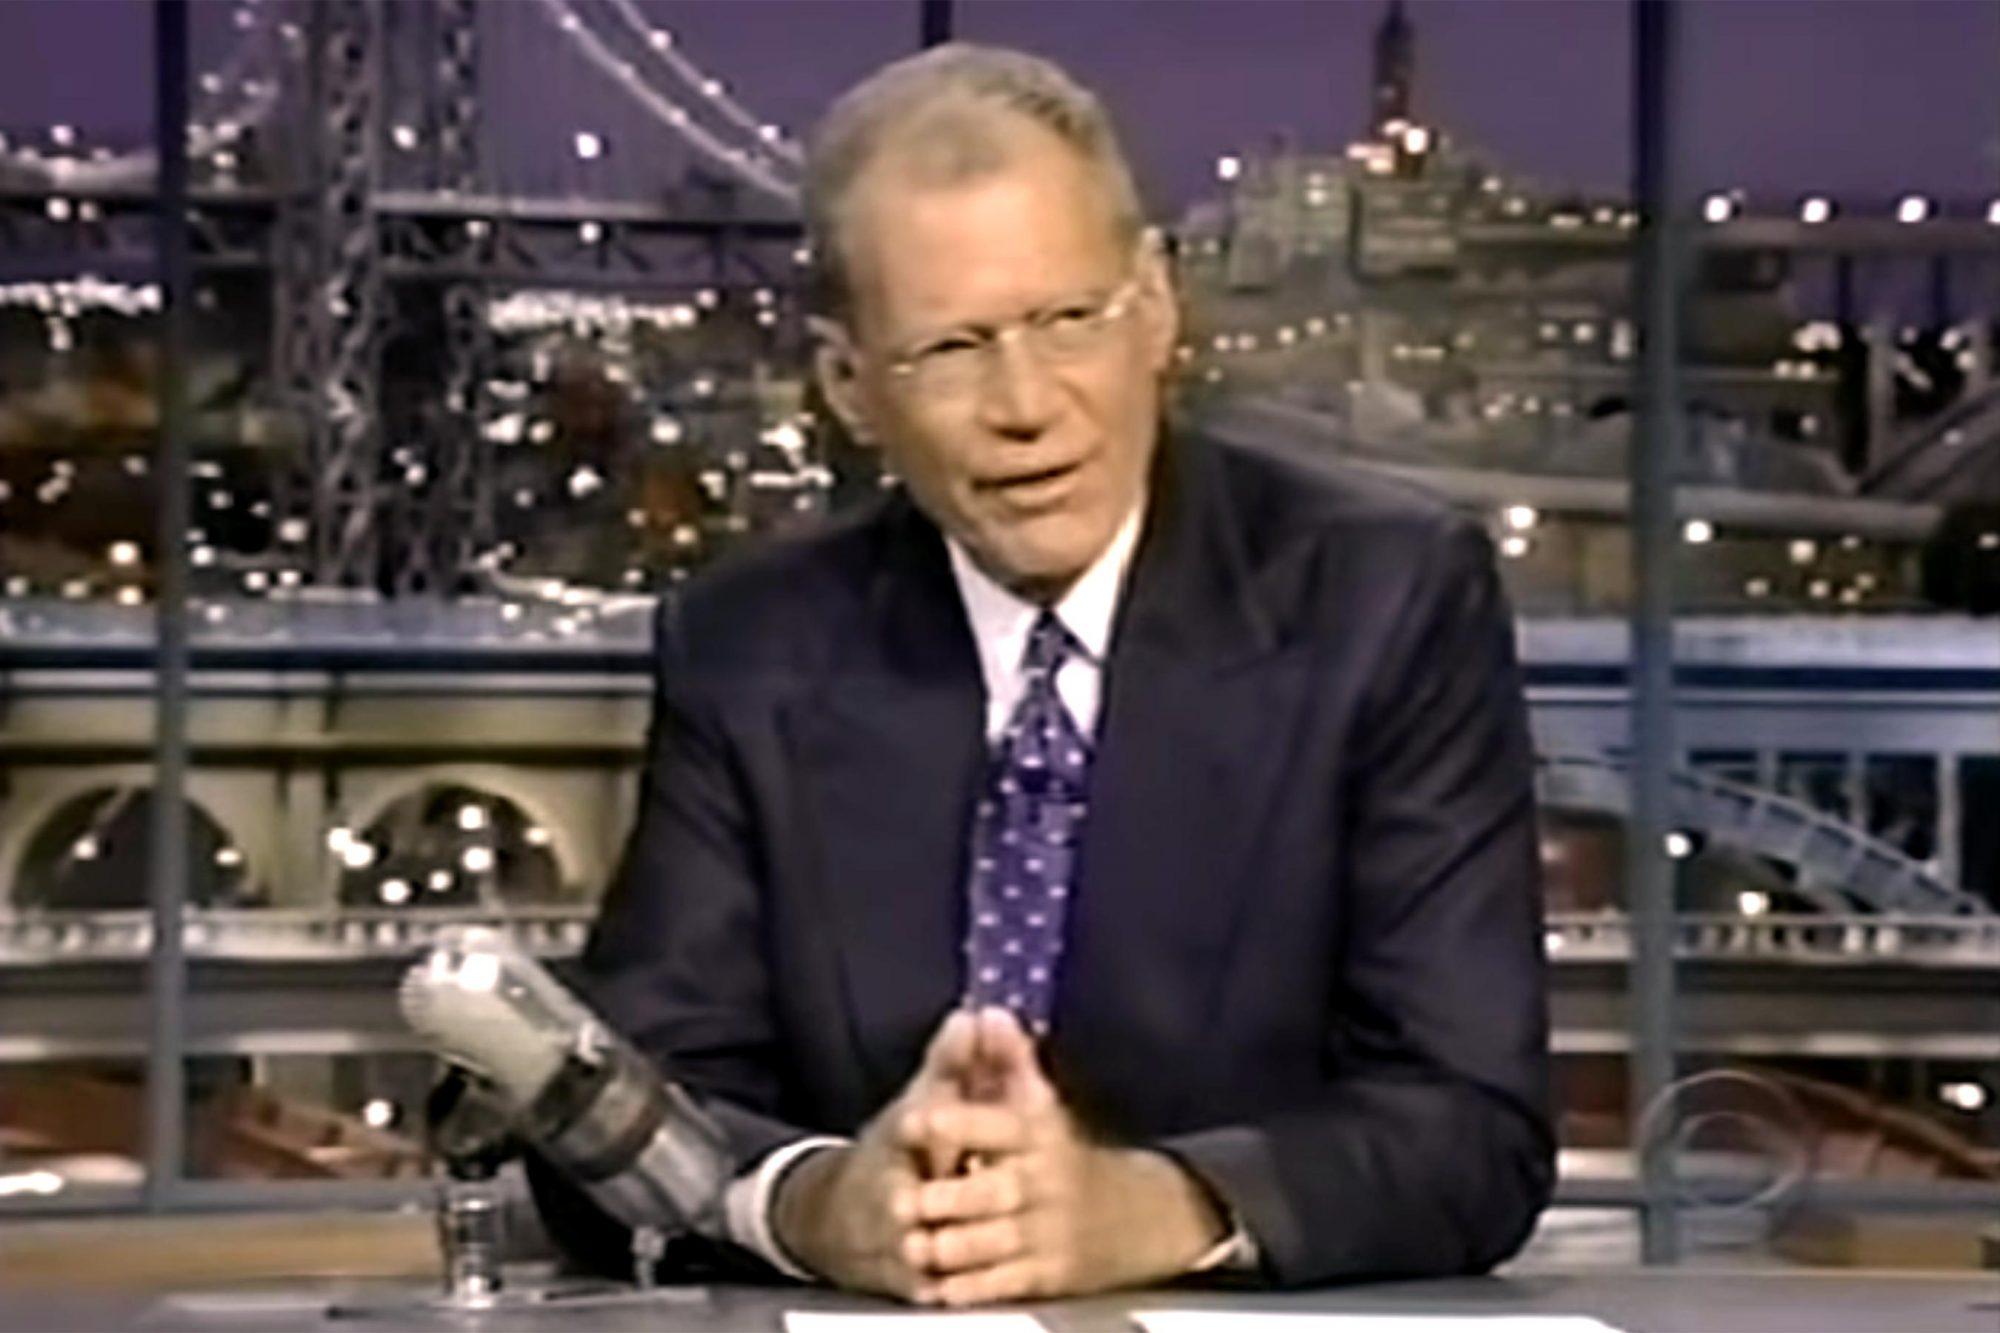 David-Letterman-4